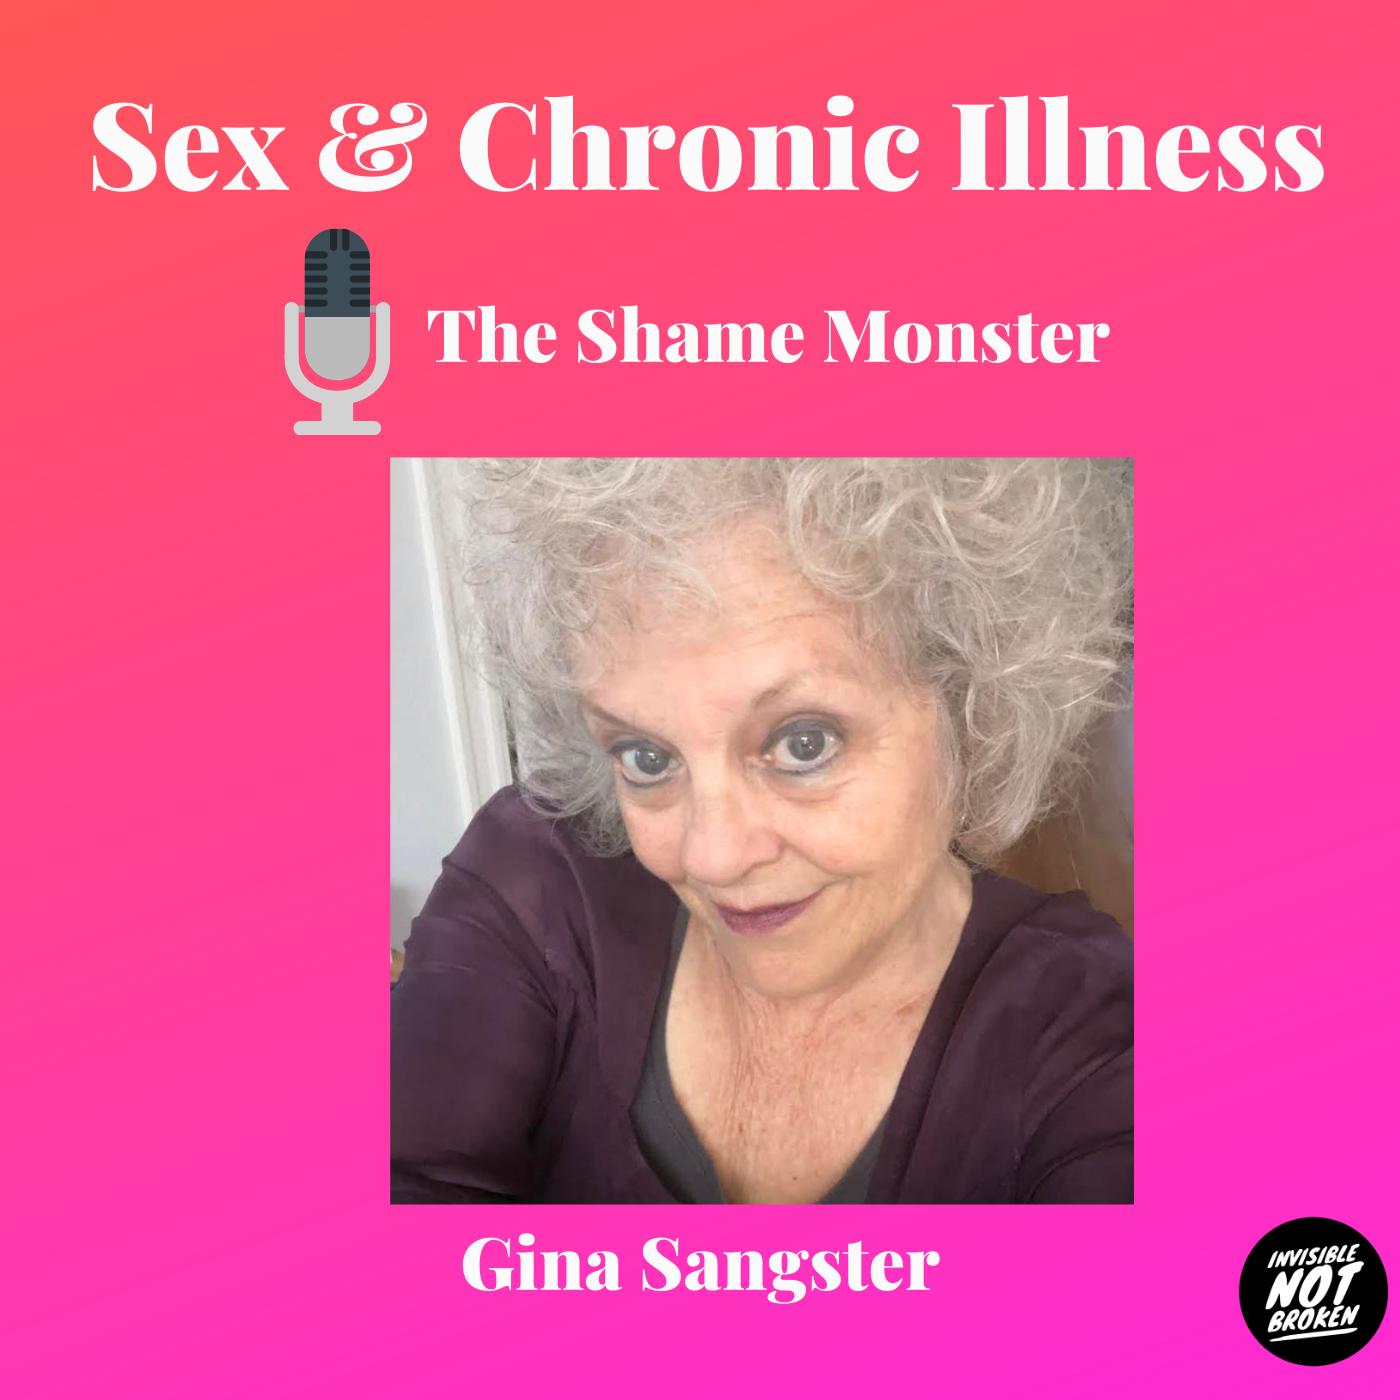 Sex and Chronic Illness - Episode 4: The Shame Monster: Gina Sangster